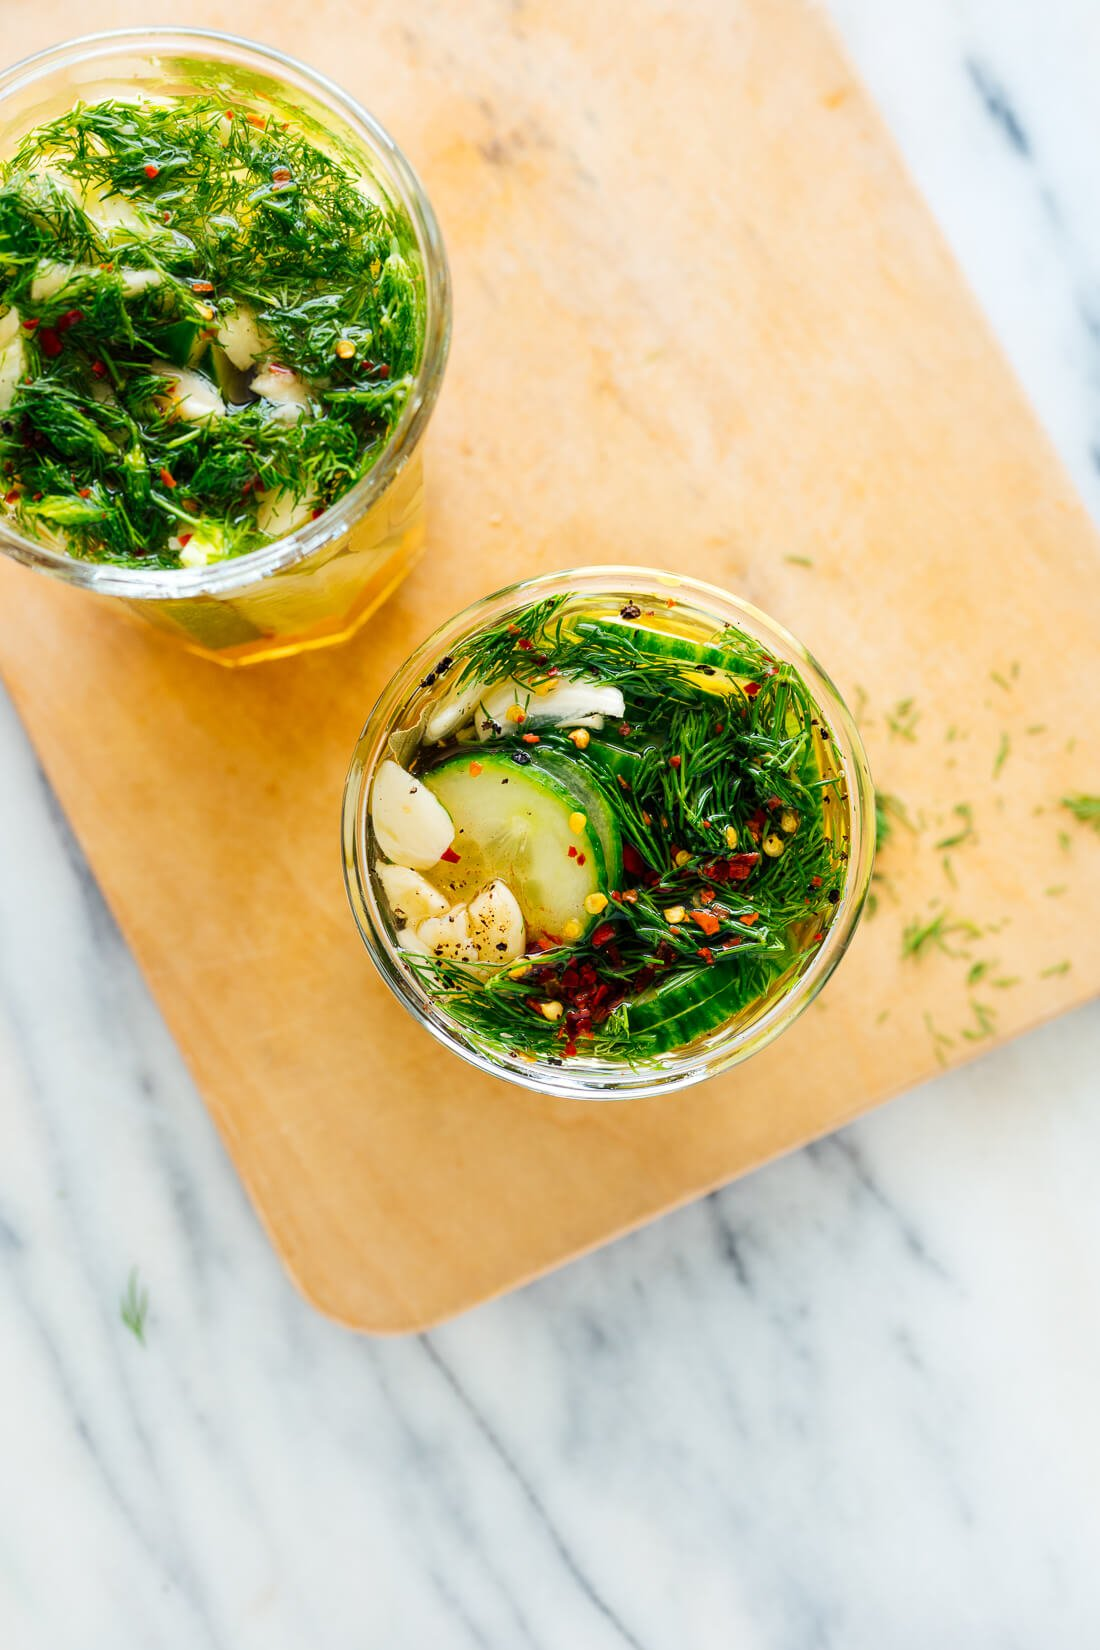 refrigerator pickles recipe (dill optional)